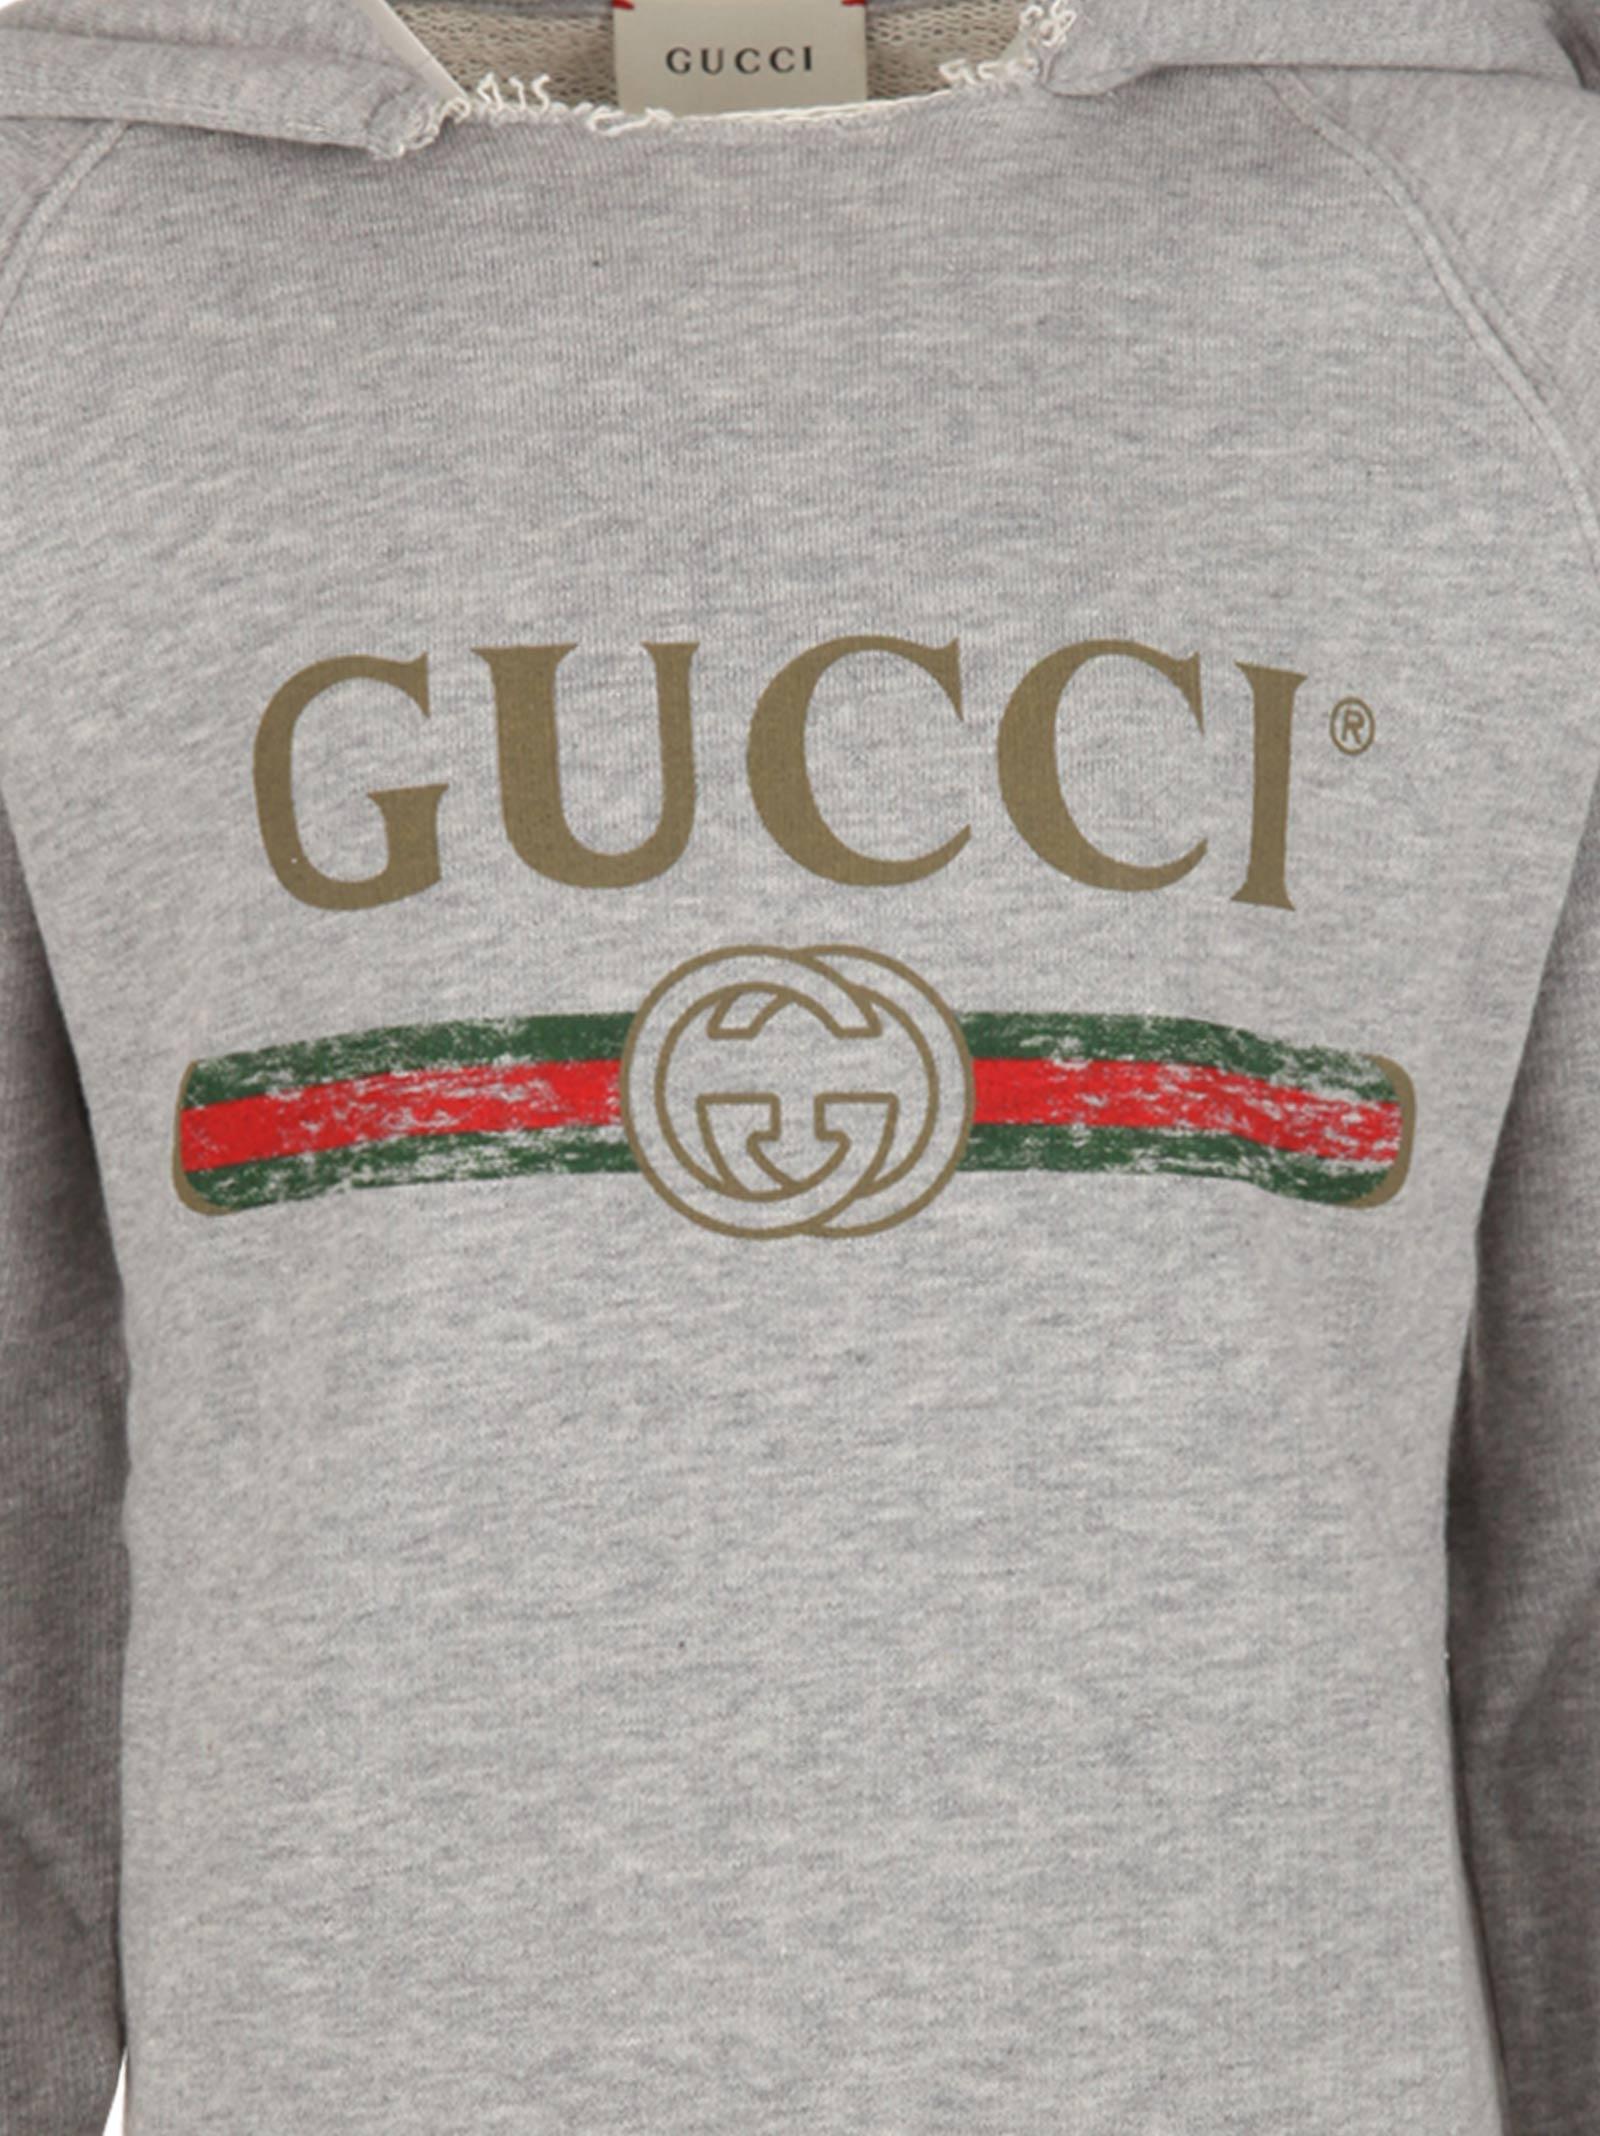 2410f9b8 Gucci Junior sweatshirt - Gucci Junior - Michele Franzese Moda